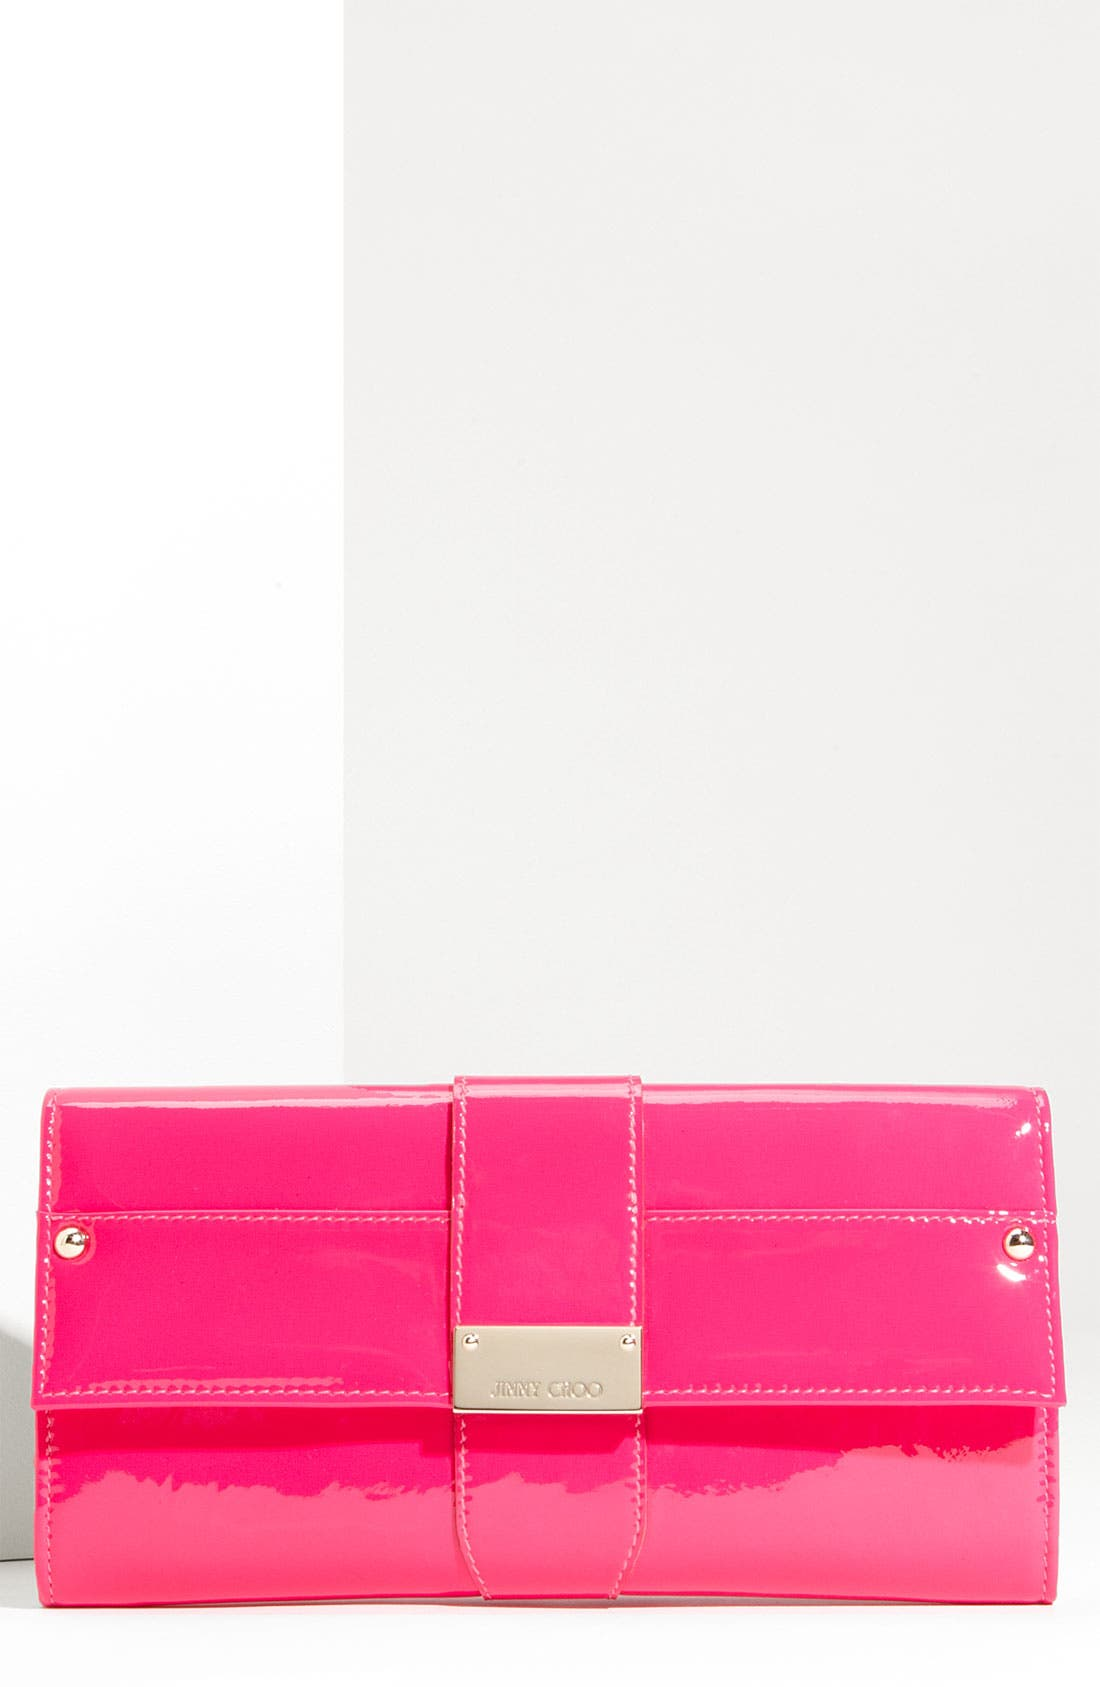 Alternate Image 1 Selected - Jimmy Choo 'Ubai' Patent Leather Clutch